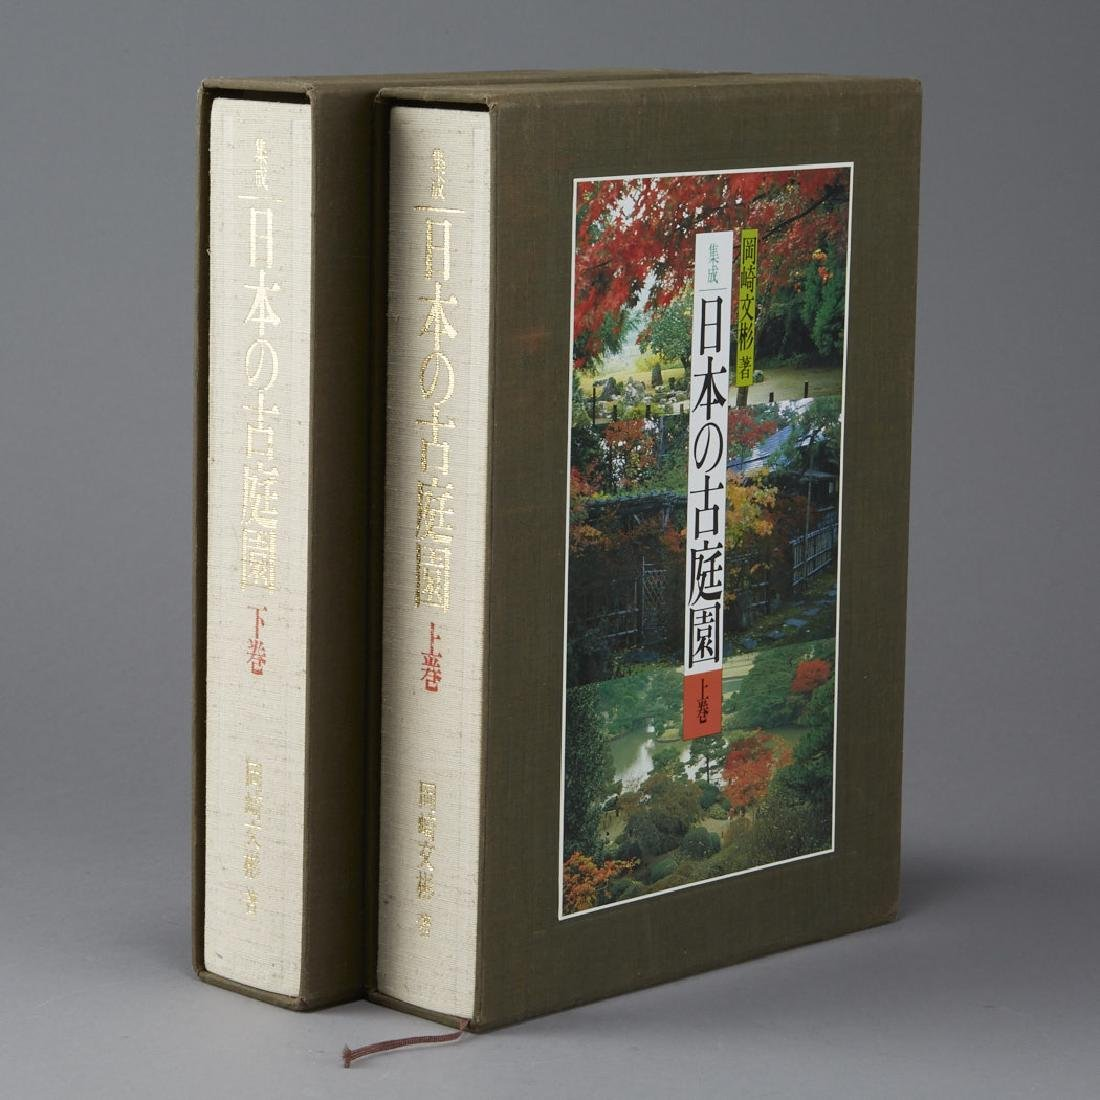 2 Gardening books Nihon No Furui Teien Japanese